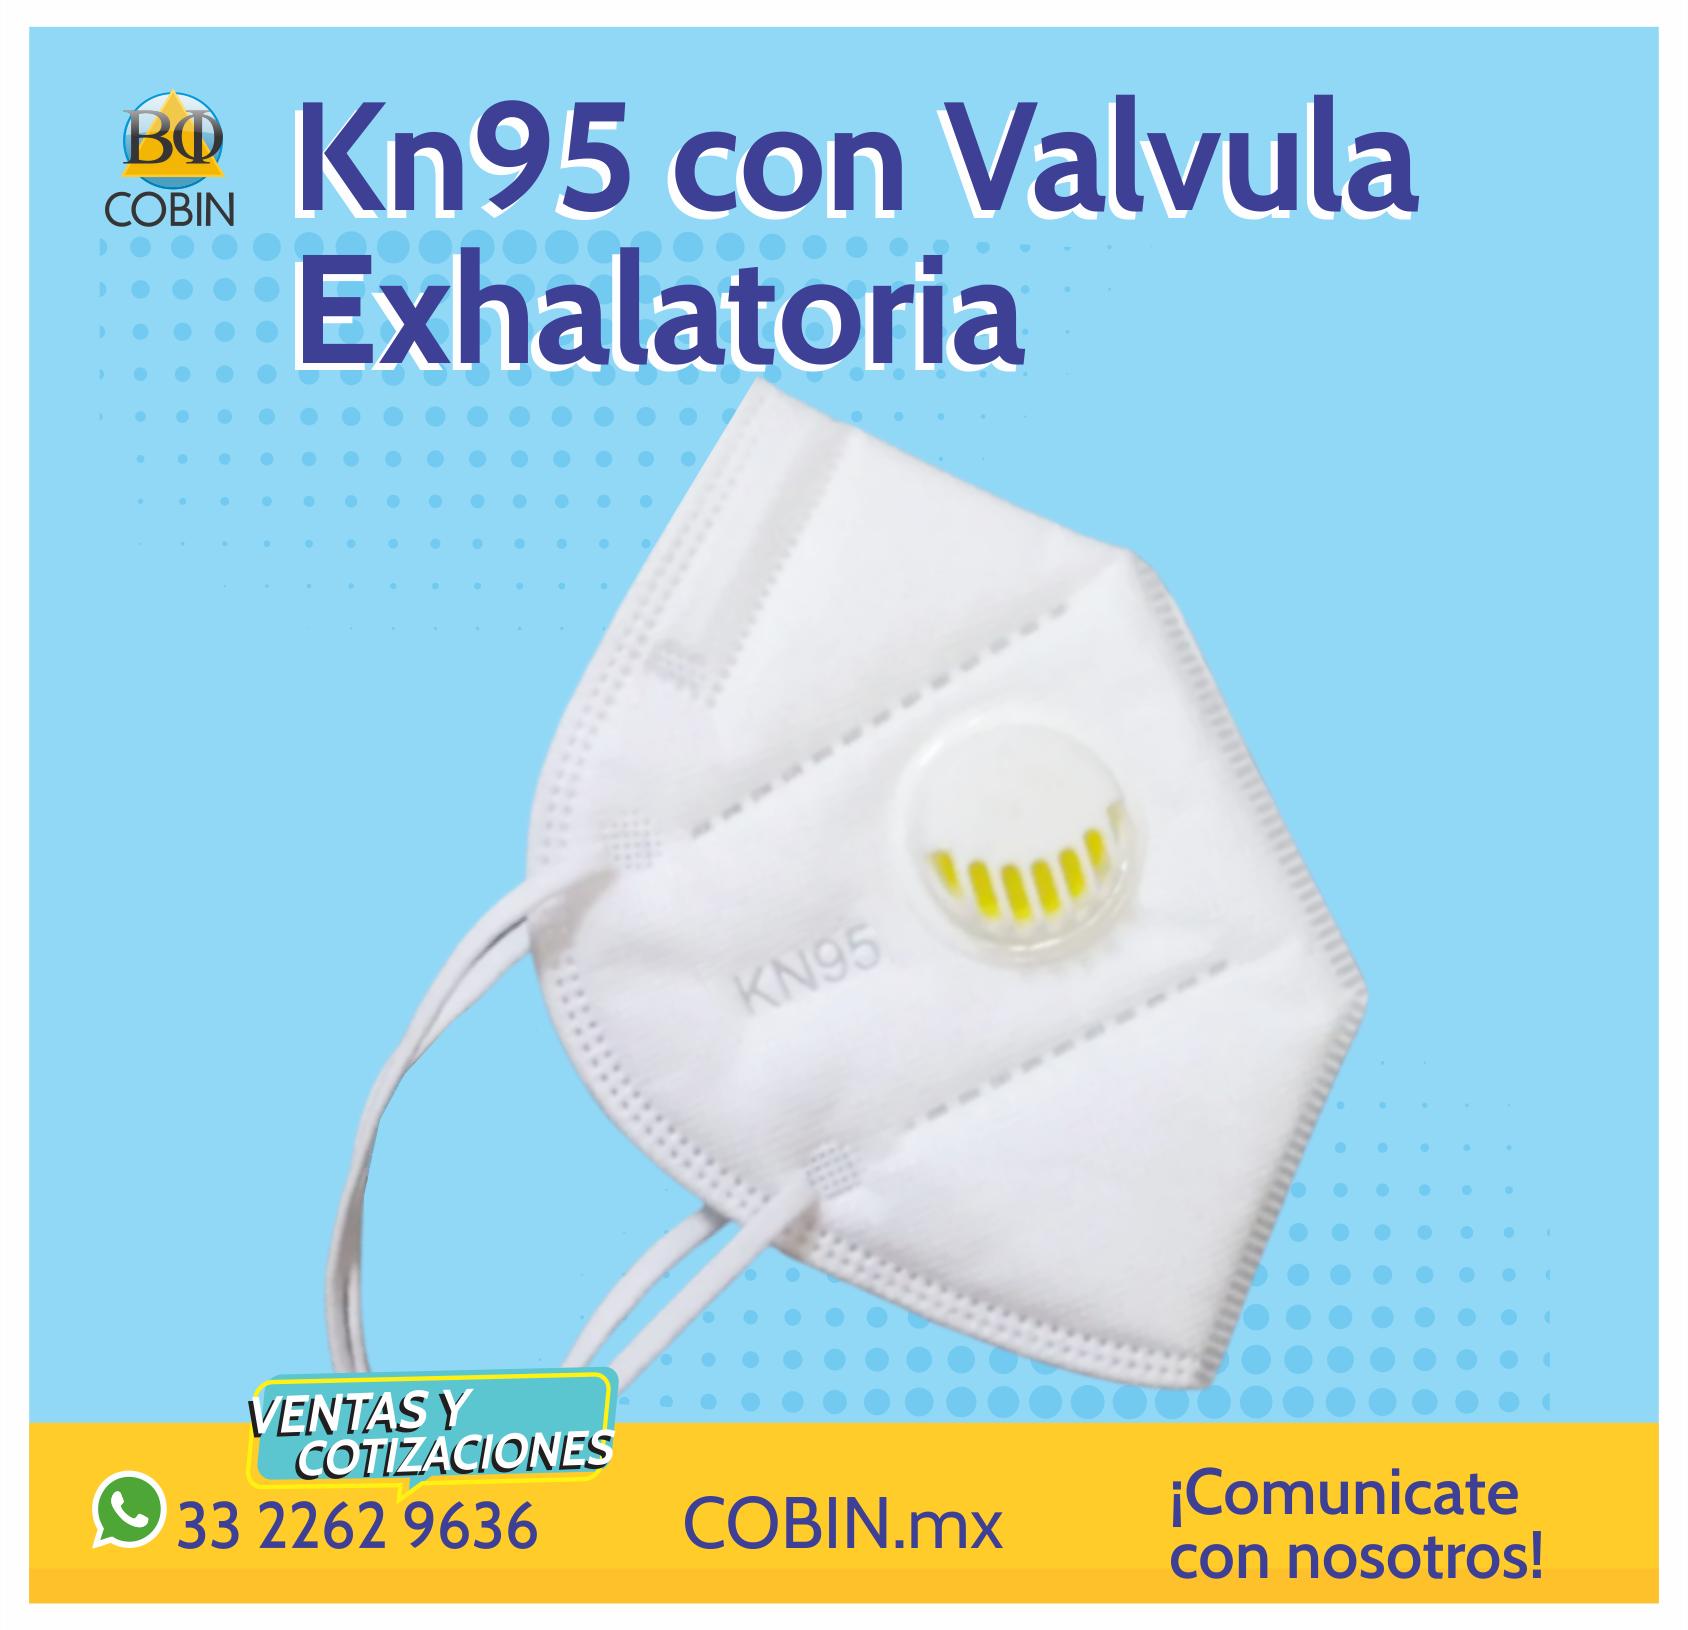 Cubrebocas KN95 con Valvula